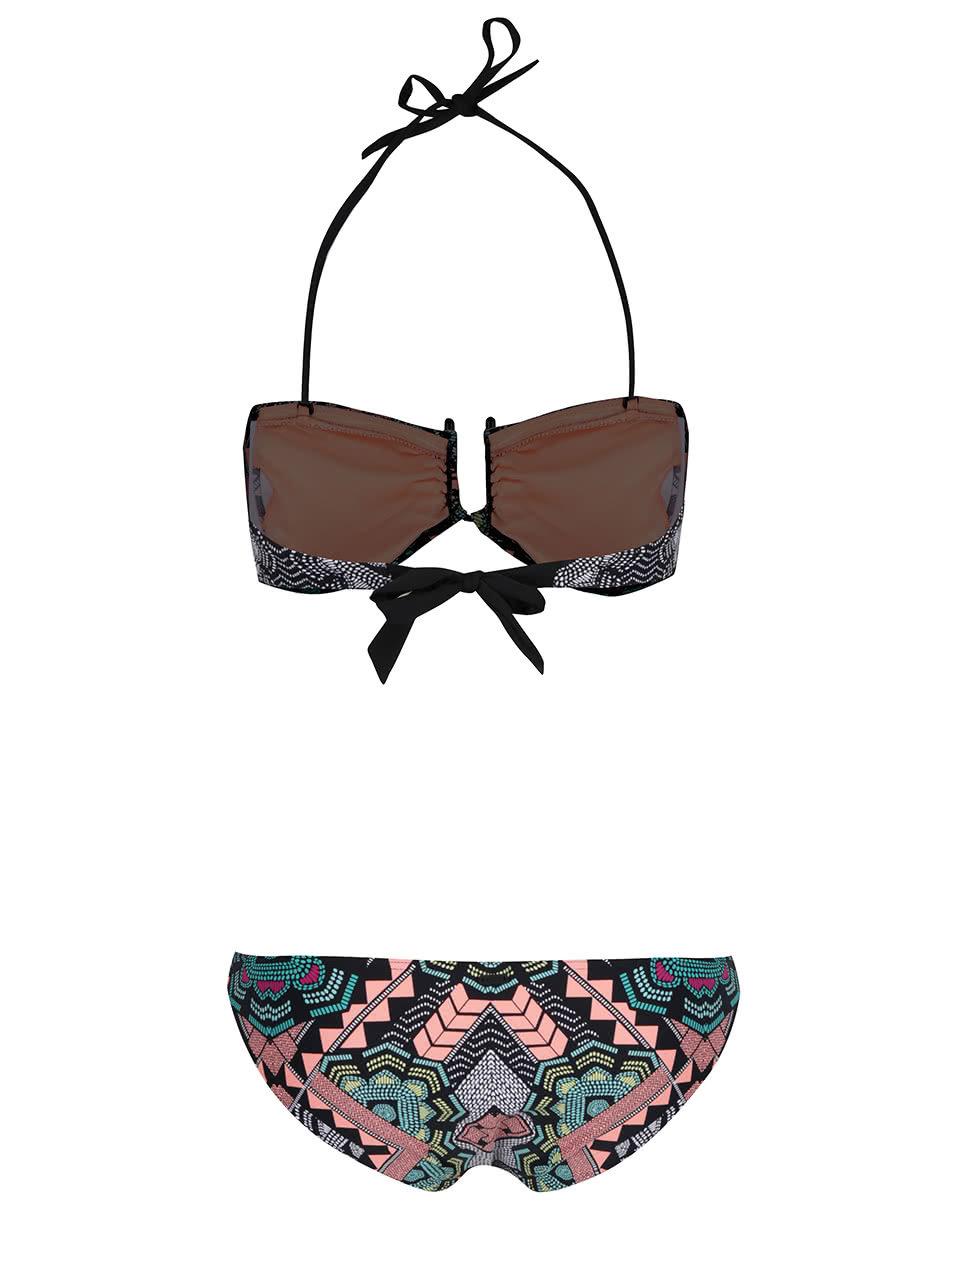 Černé dámské dvojdílné plavky se vzorem Rip Curl Fiesta ... 1b5bb49734